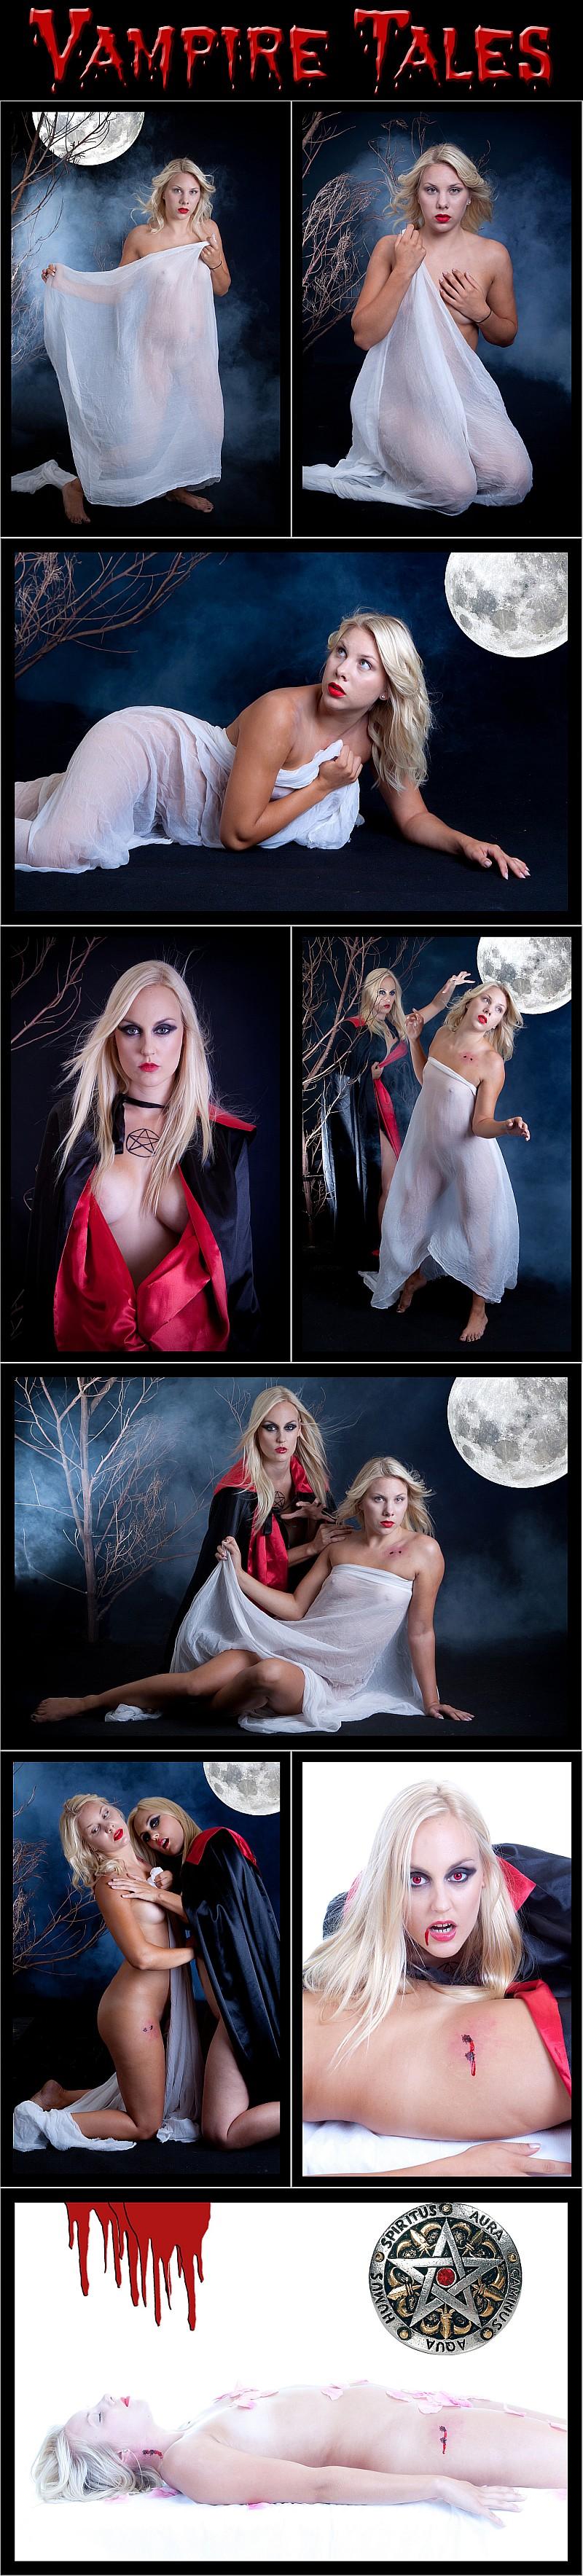 Studio Apr 05, 2010 Model Photographic Vampire tales